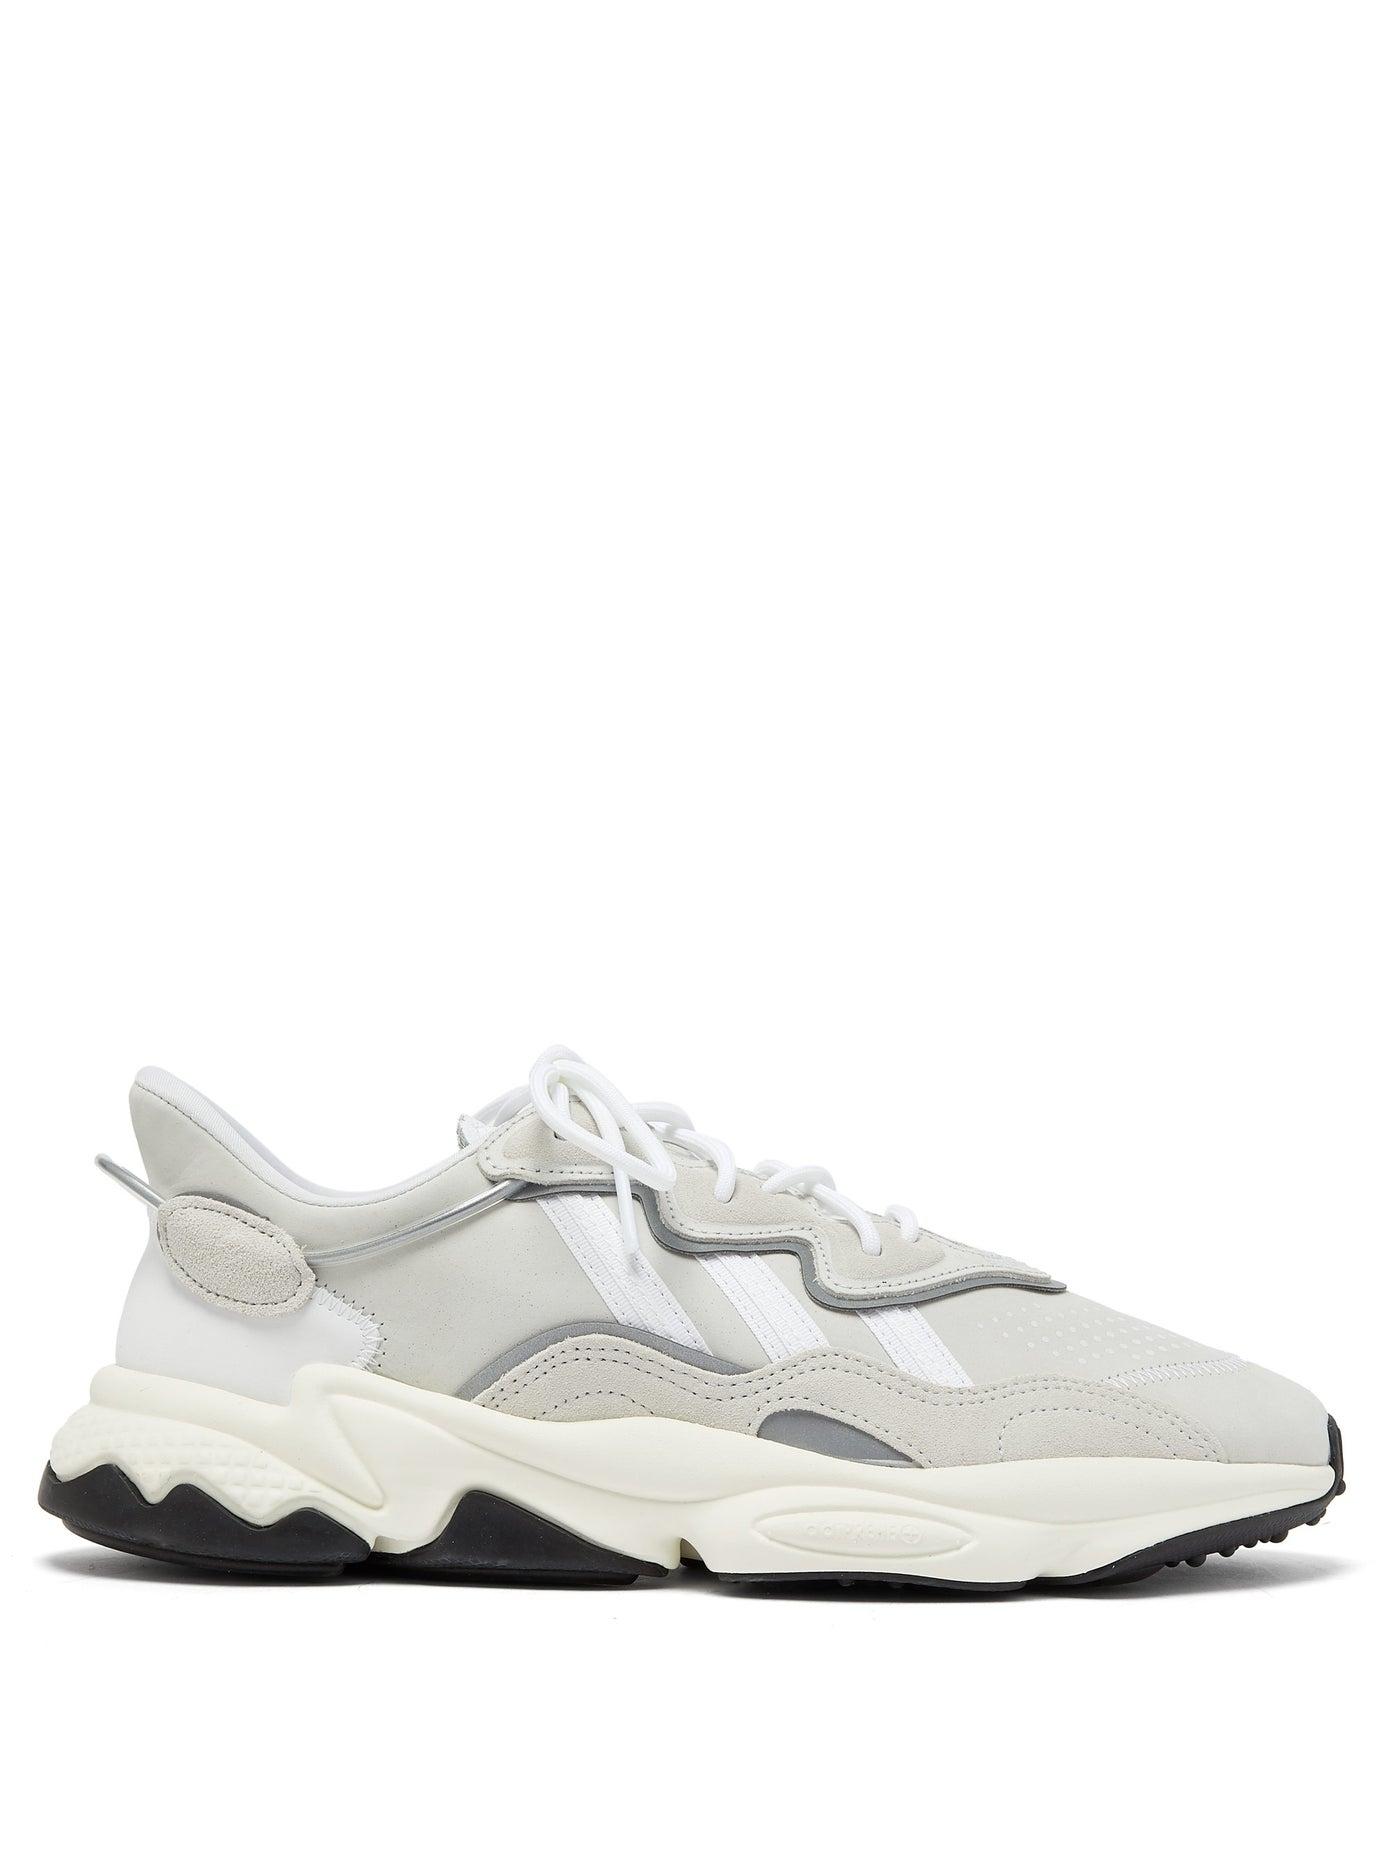 Die besten weißen Sneaker 2020: Adidas white sneakers